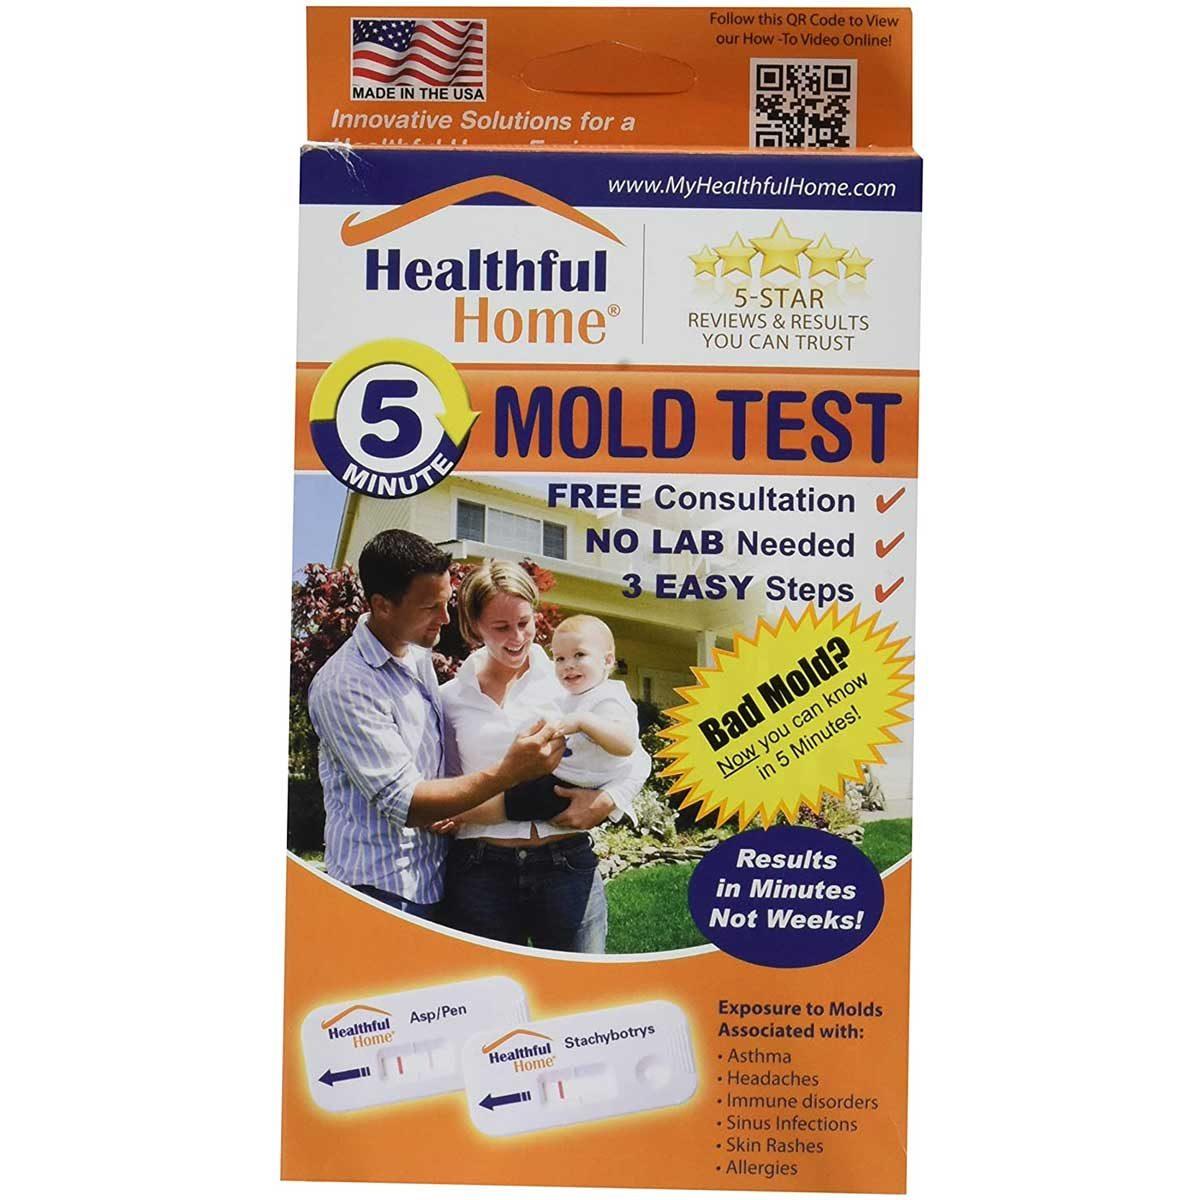 Mold test